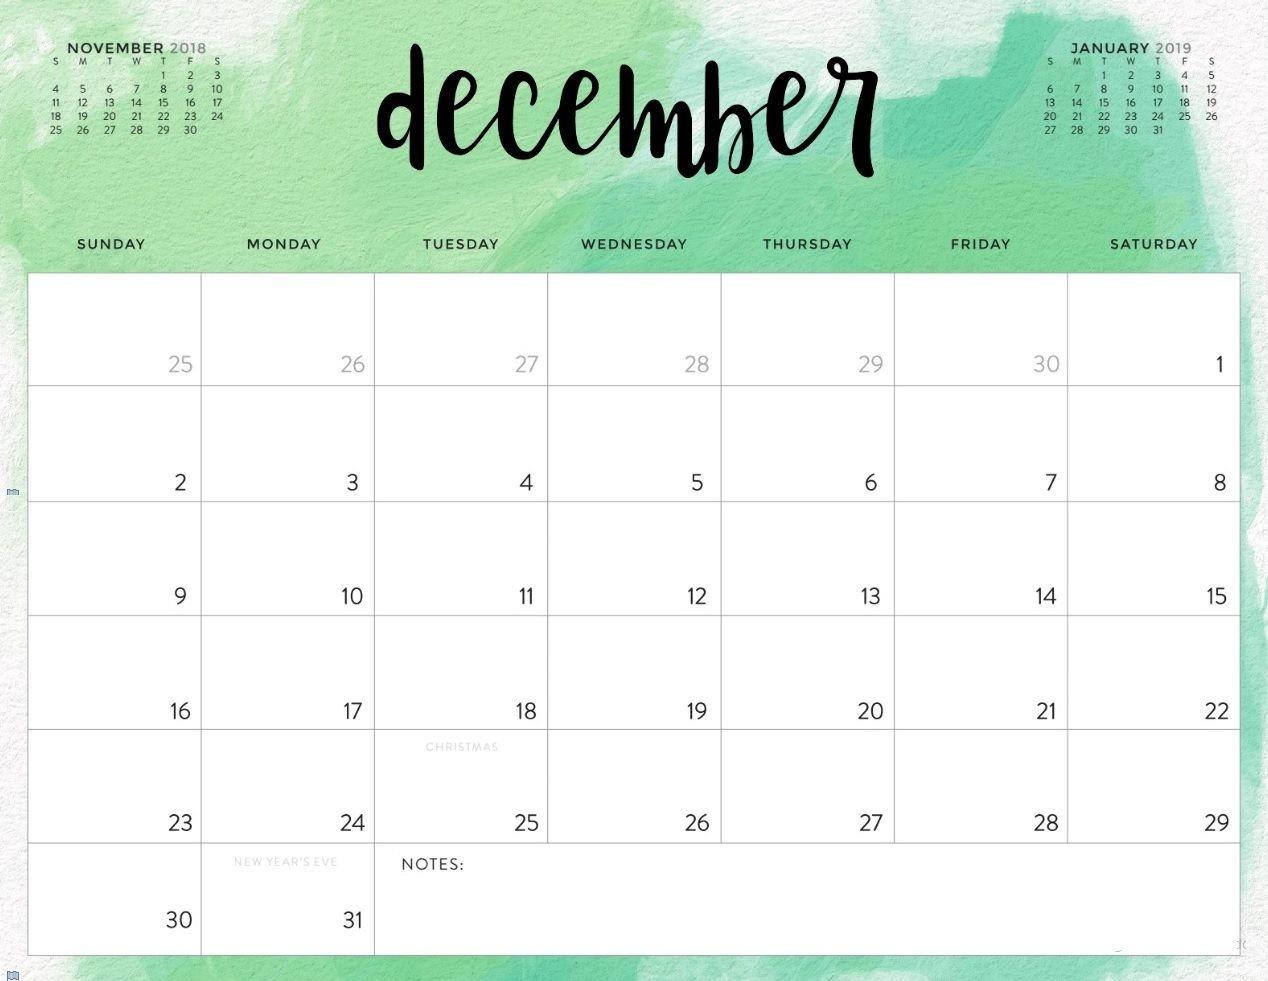 Custom Calendar For Business - Marry Steven - Medium Calendar I Can Download And Edit